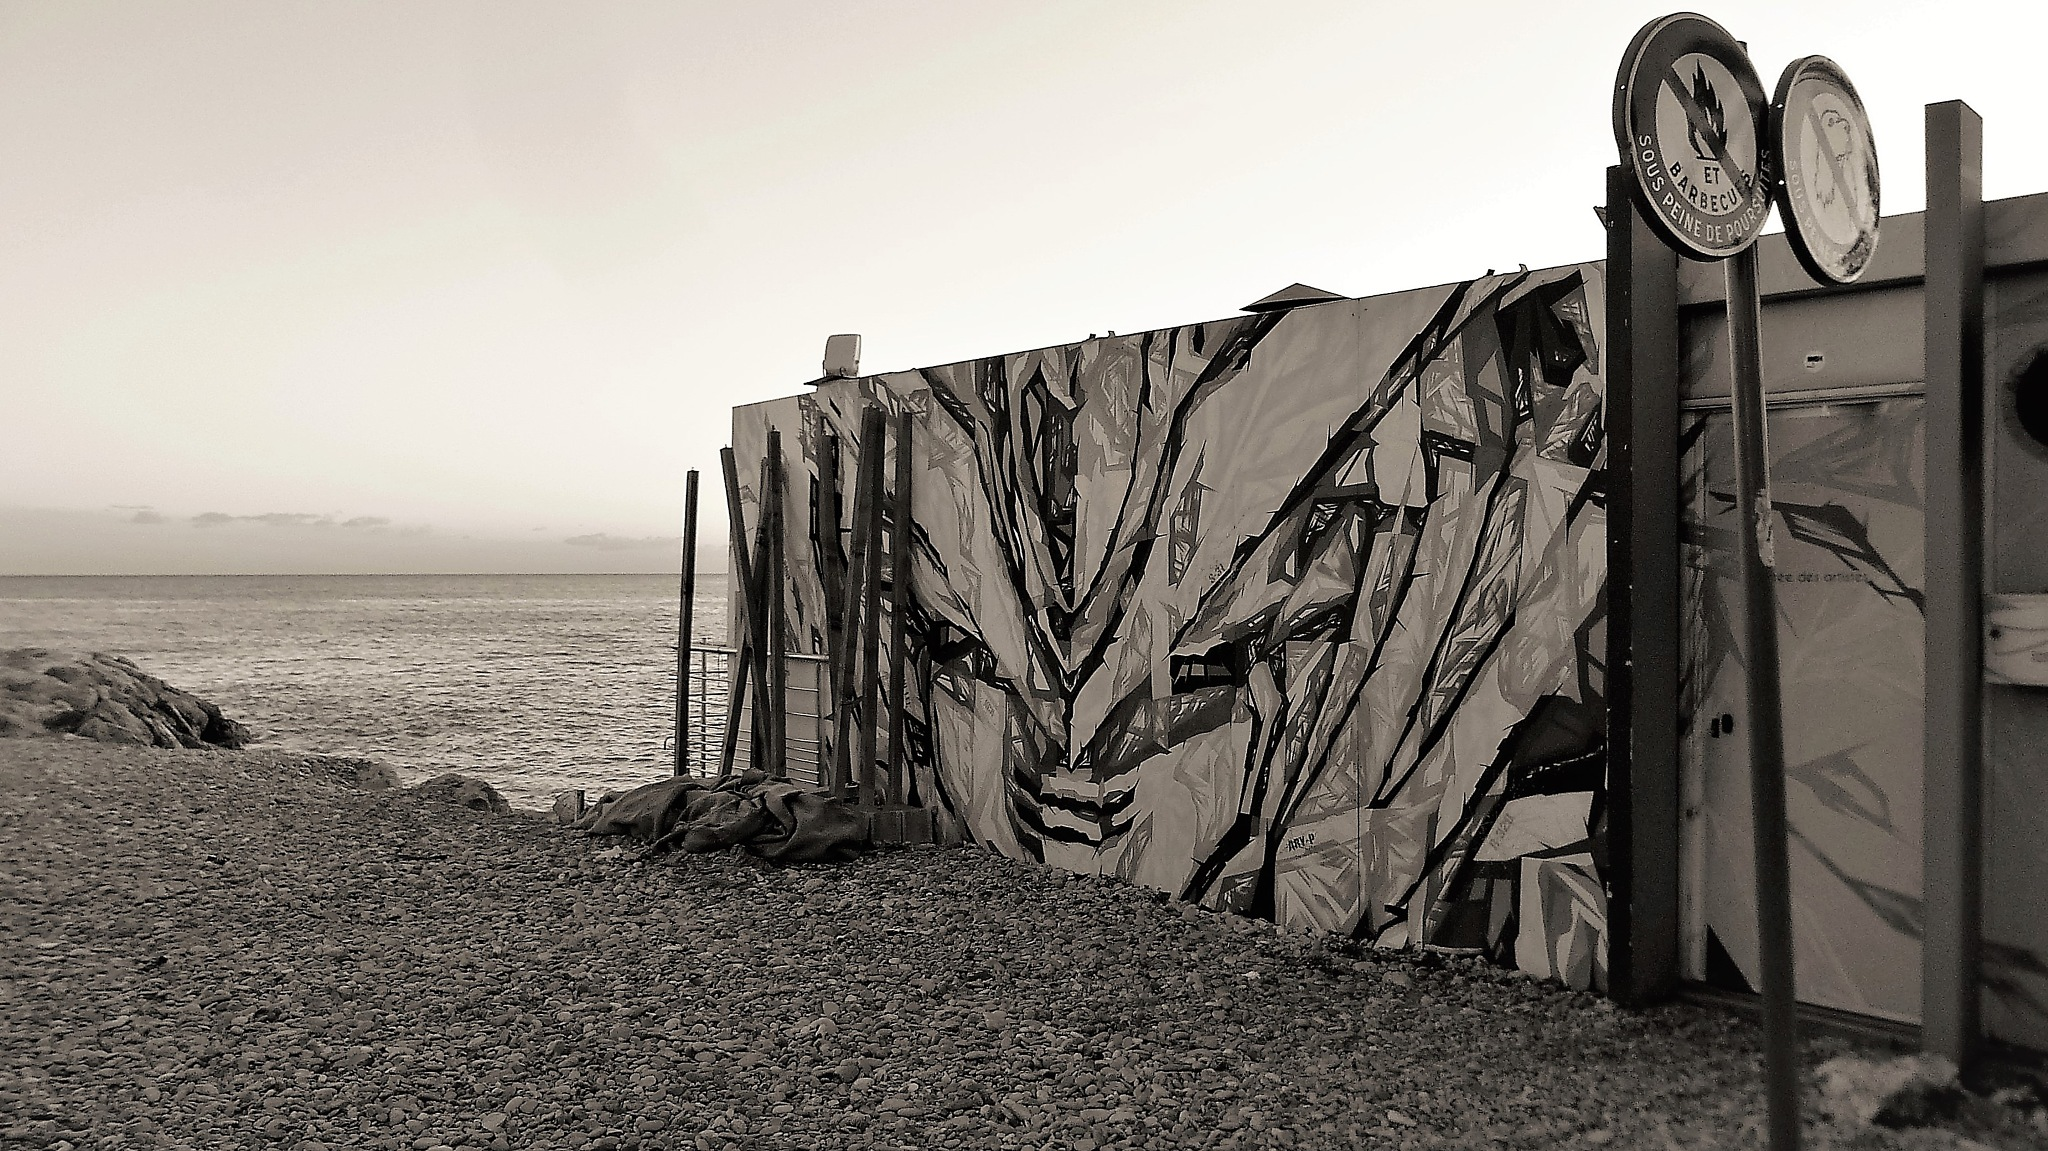 Tag sur plage by Jean François Ollivier